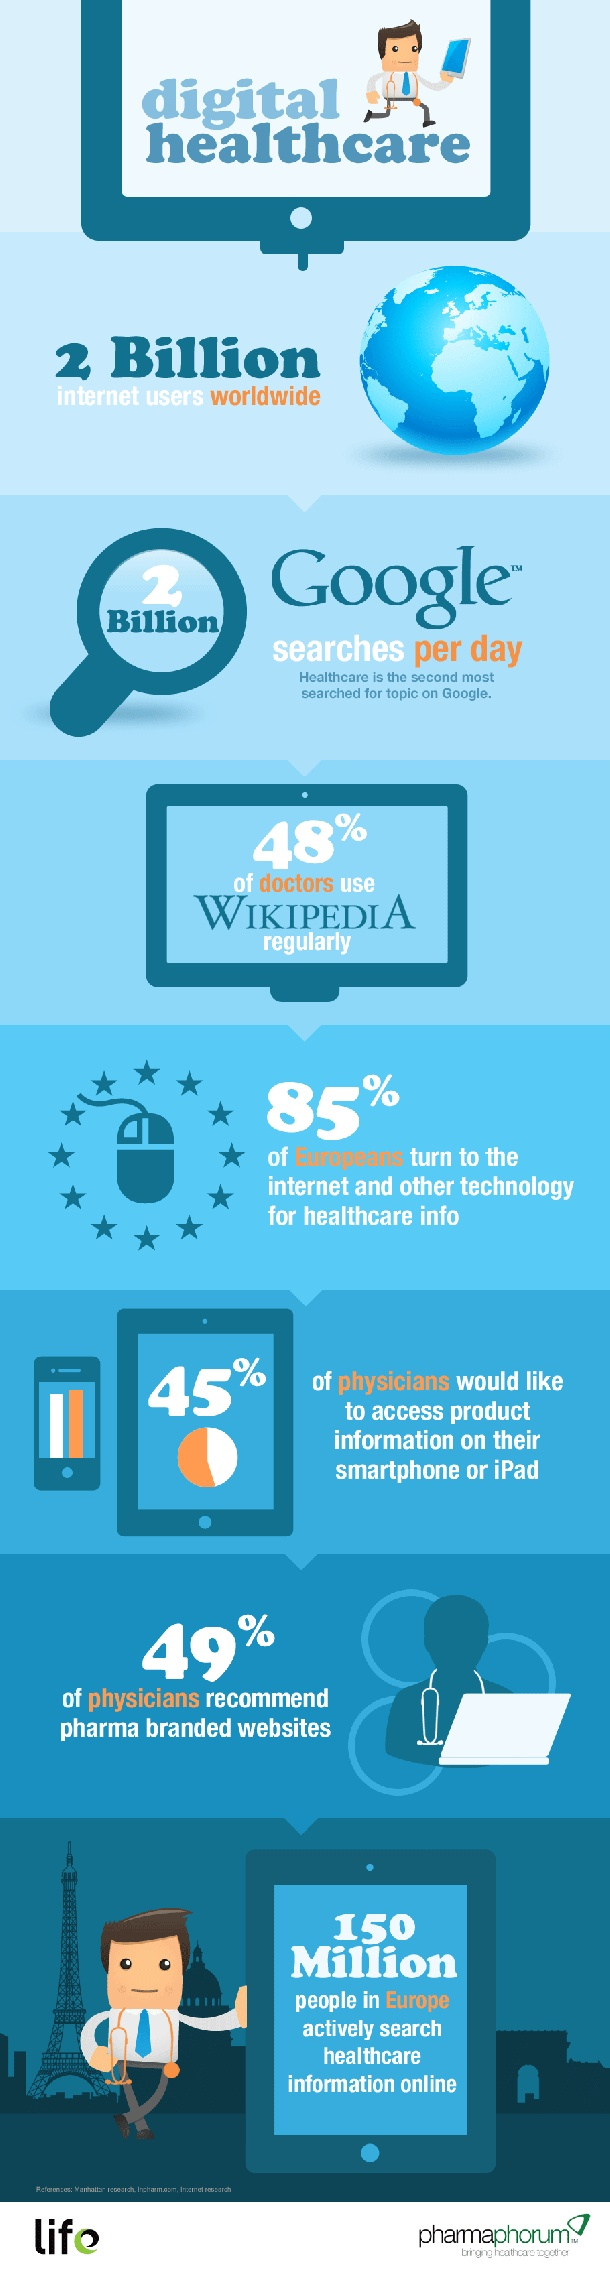 Digital Healthcare infographic